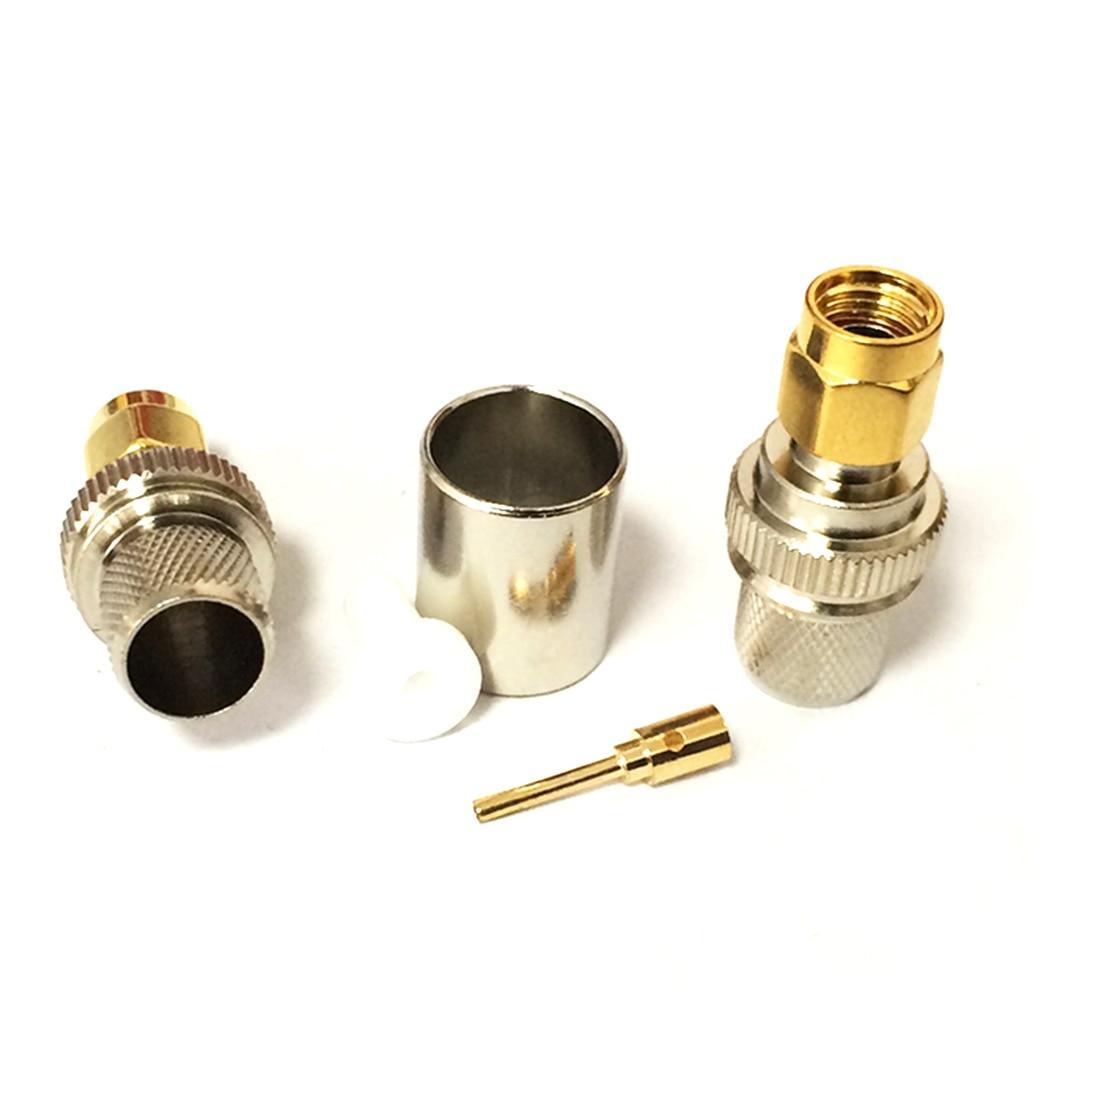 1pc RP-SMA  Male Plug  RF Coax Modem Convertor Connector Crimp  RG8,RG213,LMR400   Straight  Nickelplated  NEW wholesale